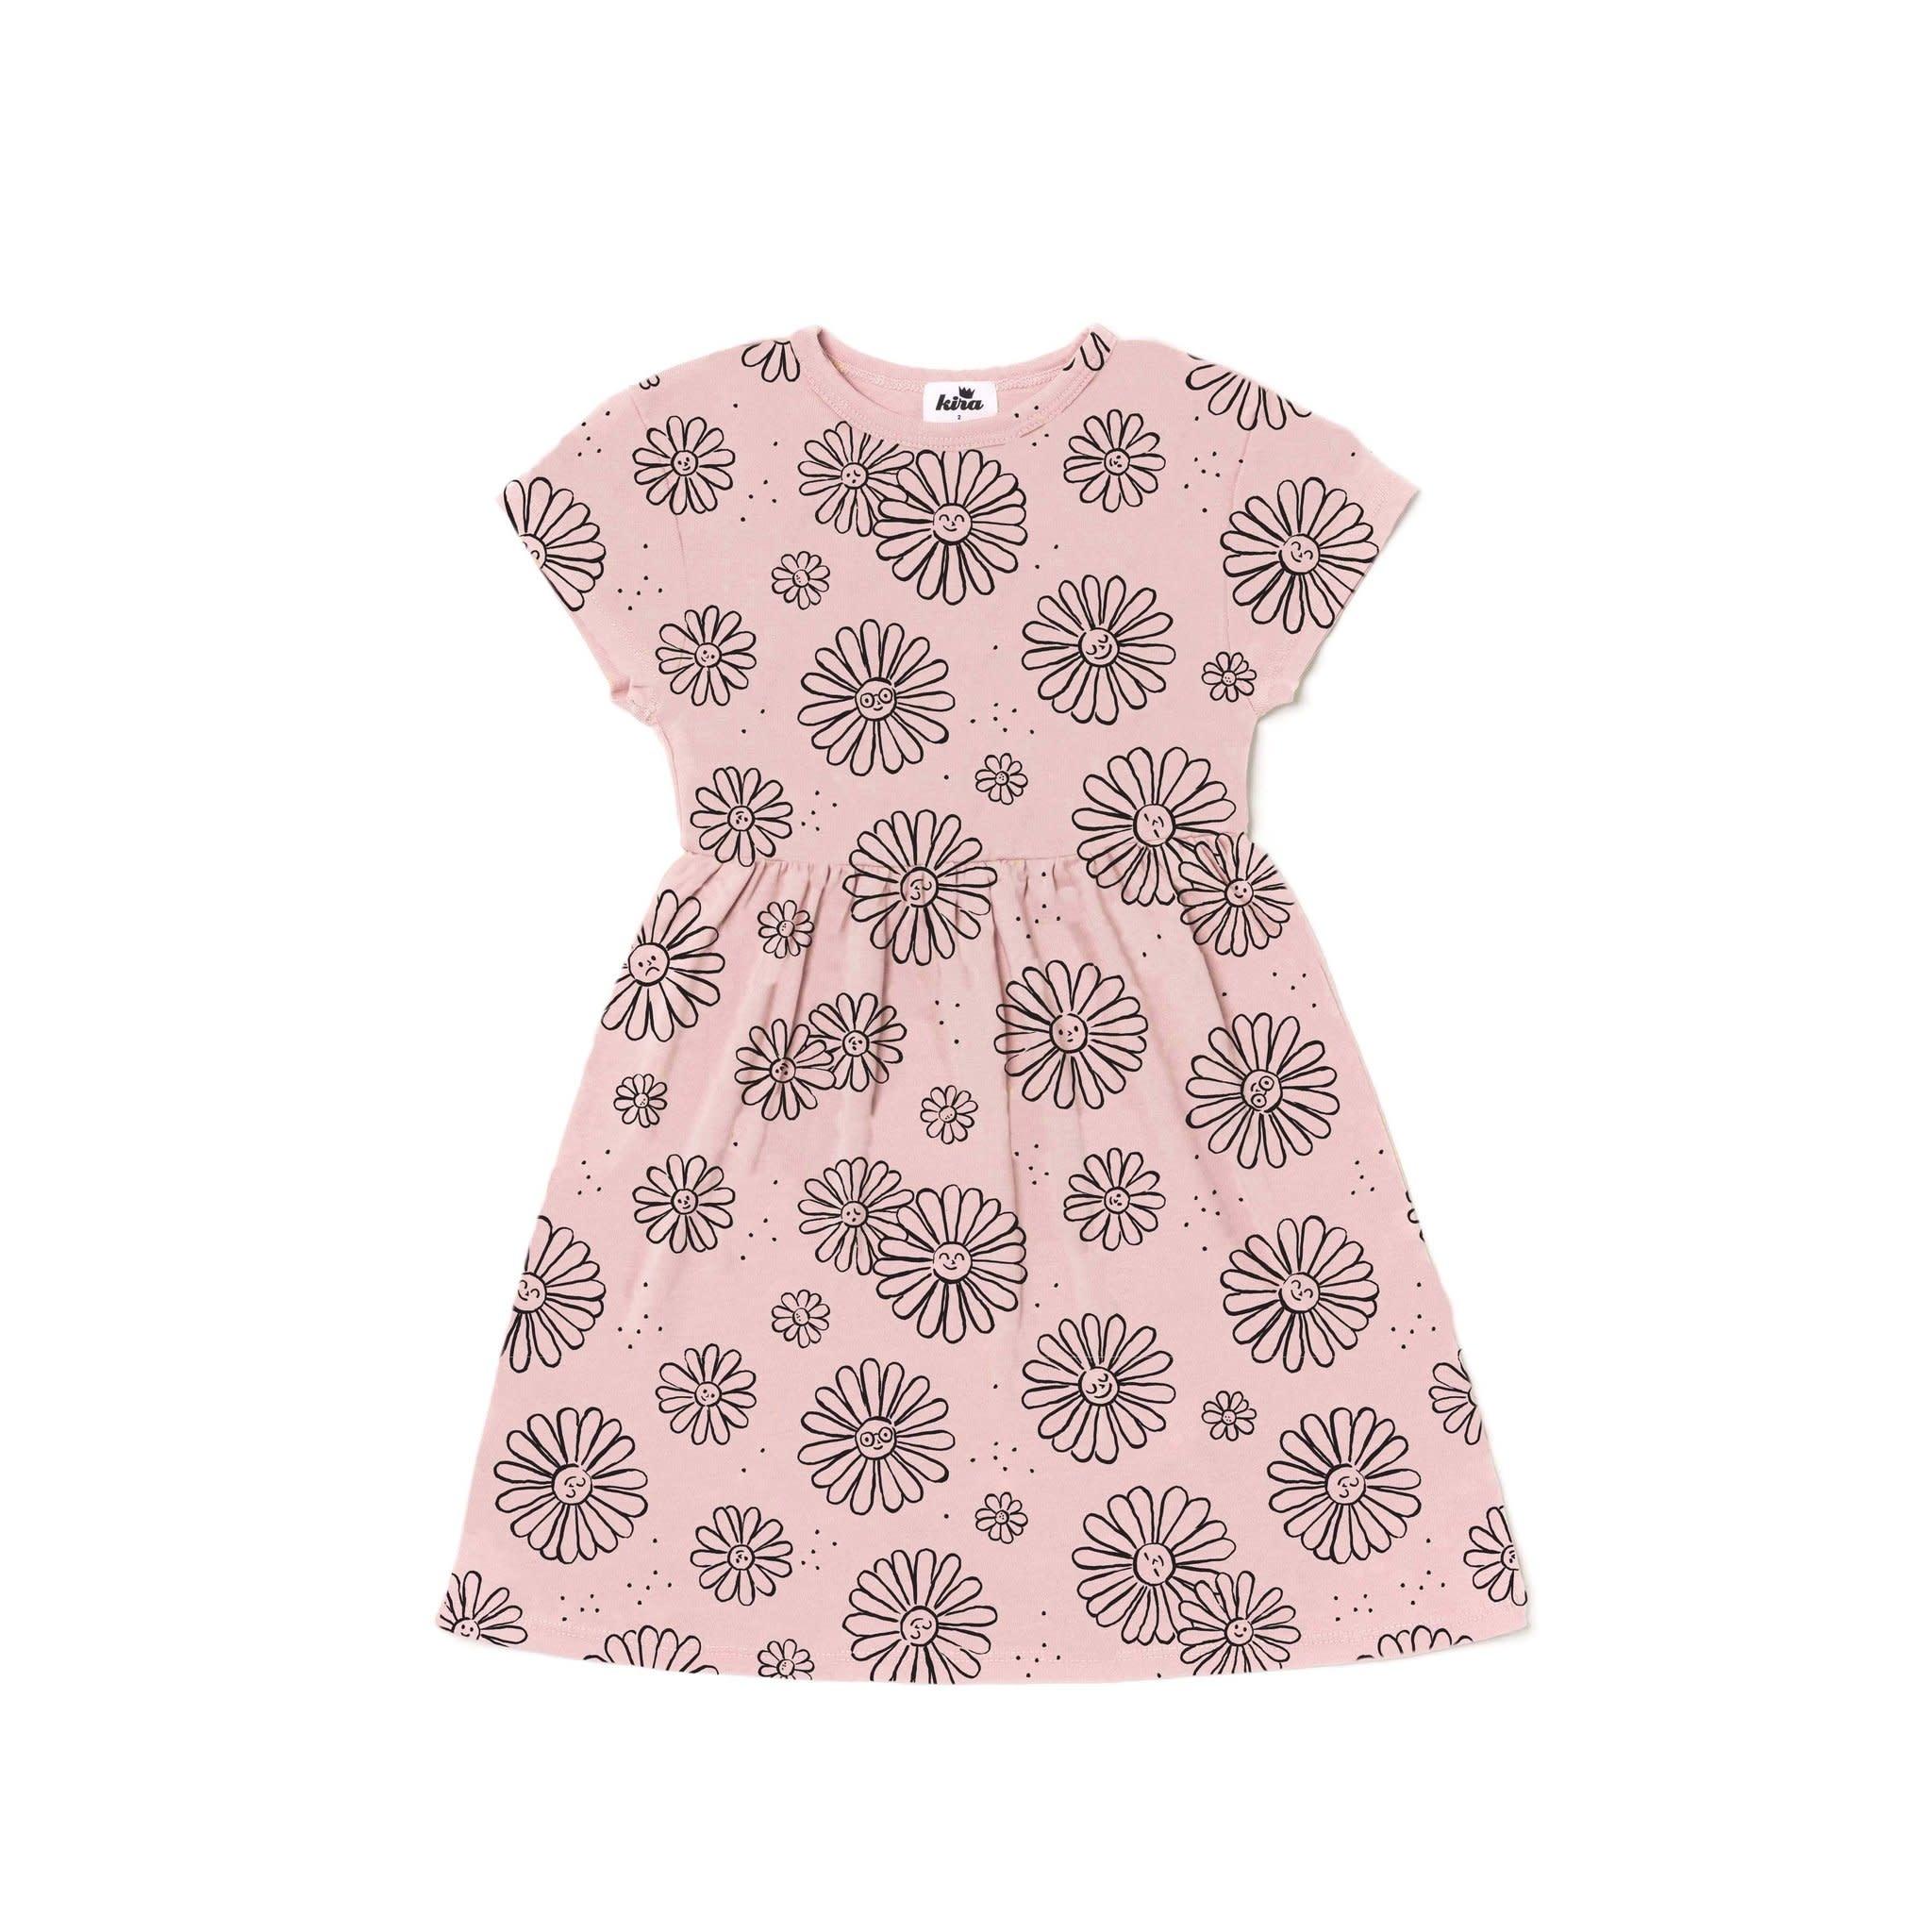 Kira Kira - Daisies Print Baby Doll Dress - Blush